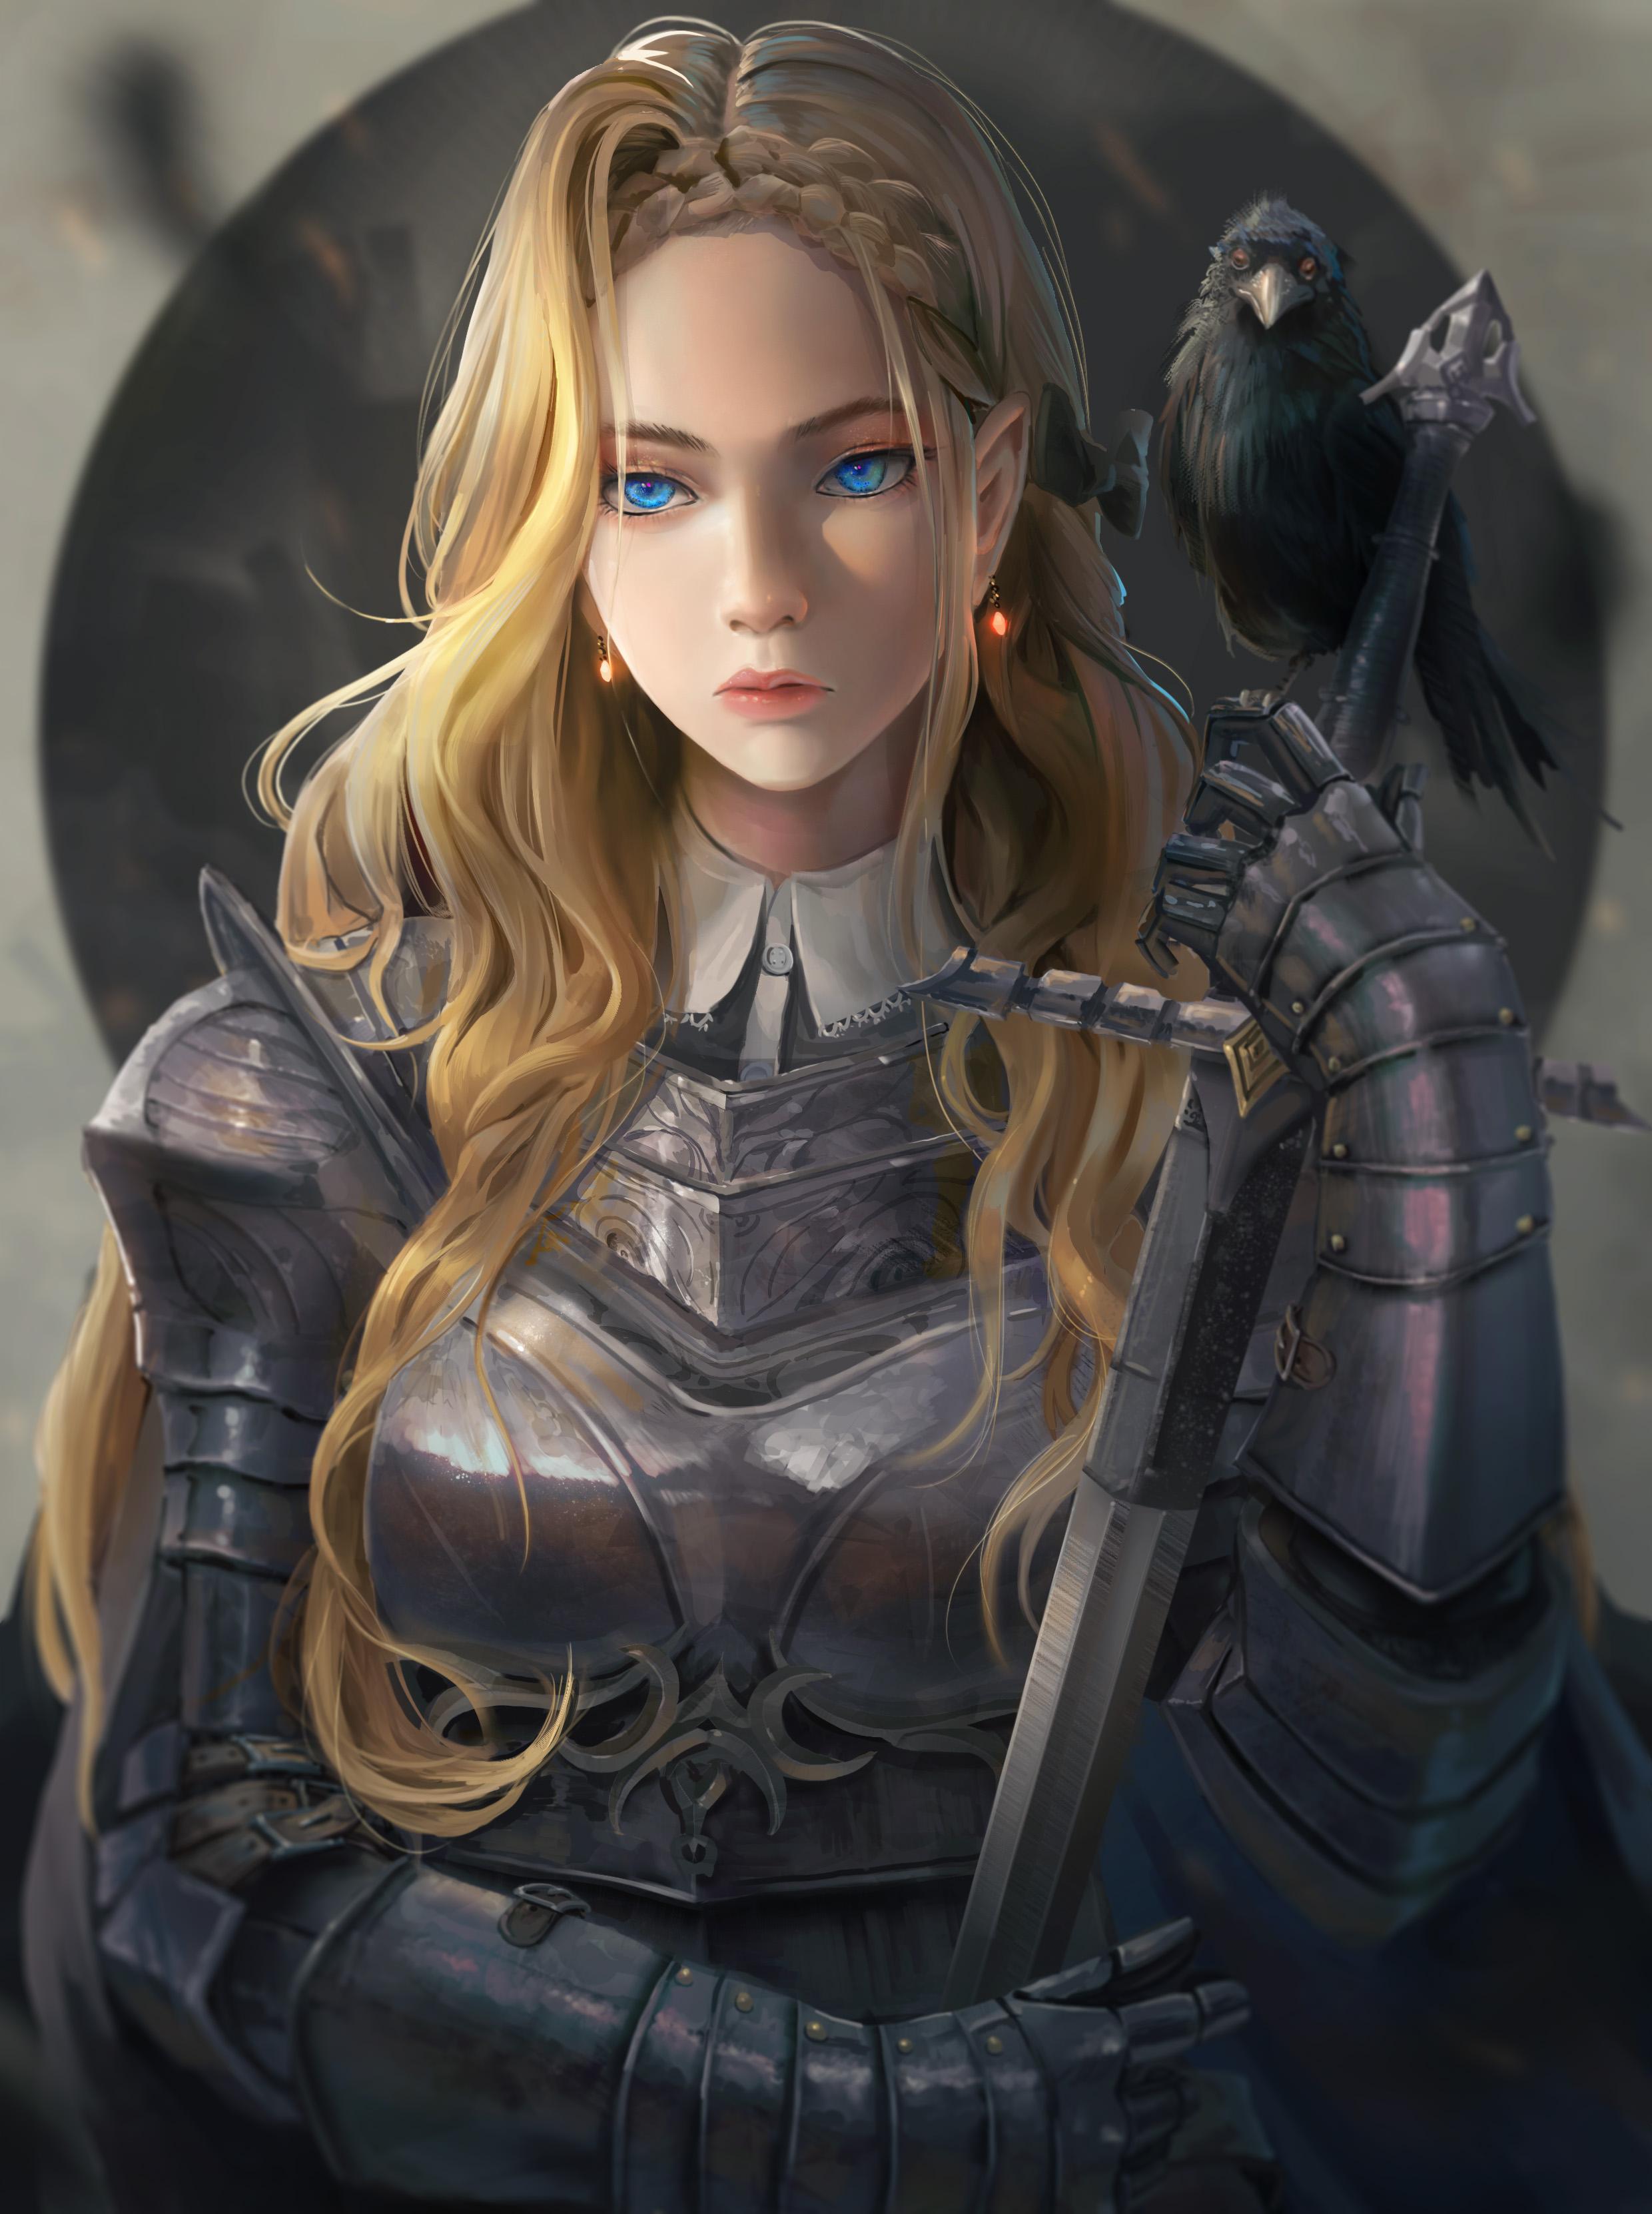 Knight [Original]